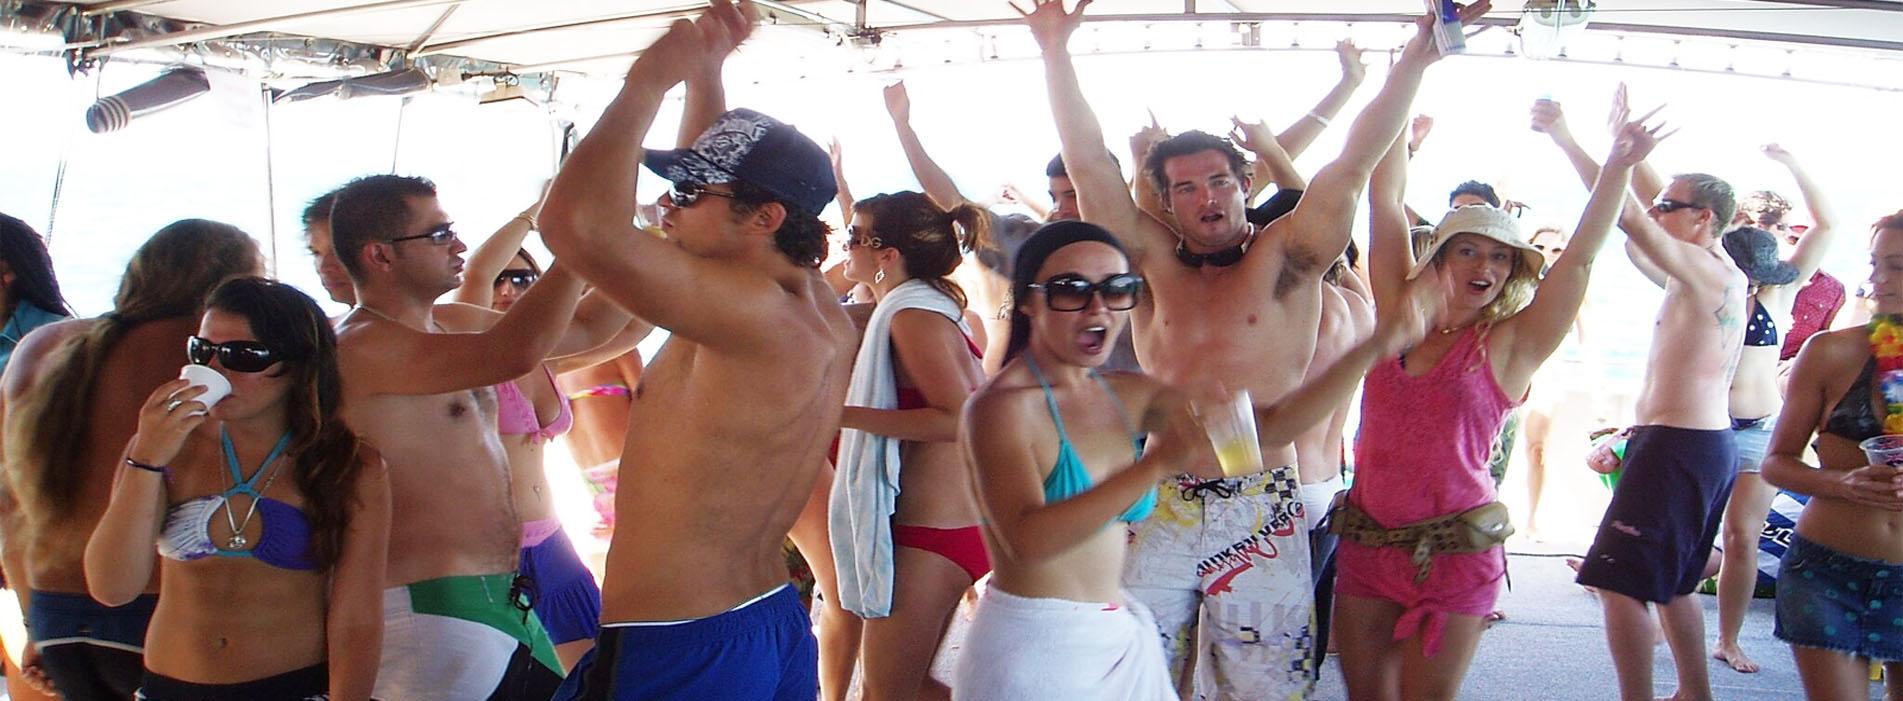 TOP-GUN-party-boat-charter-people-dancing-Perth-wa